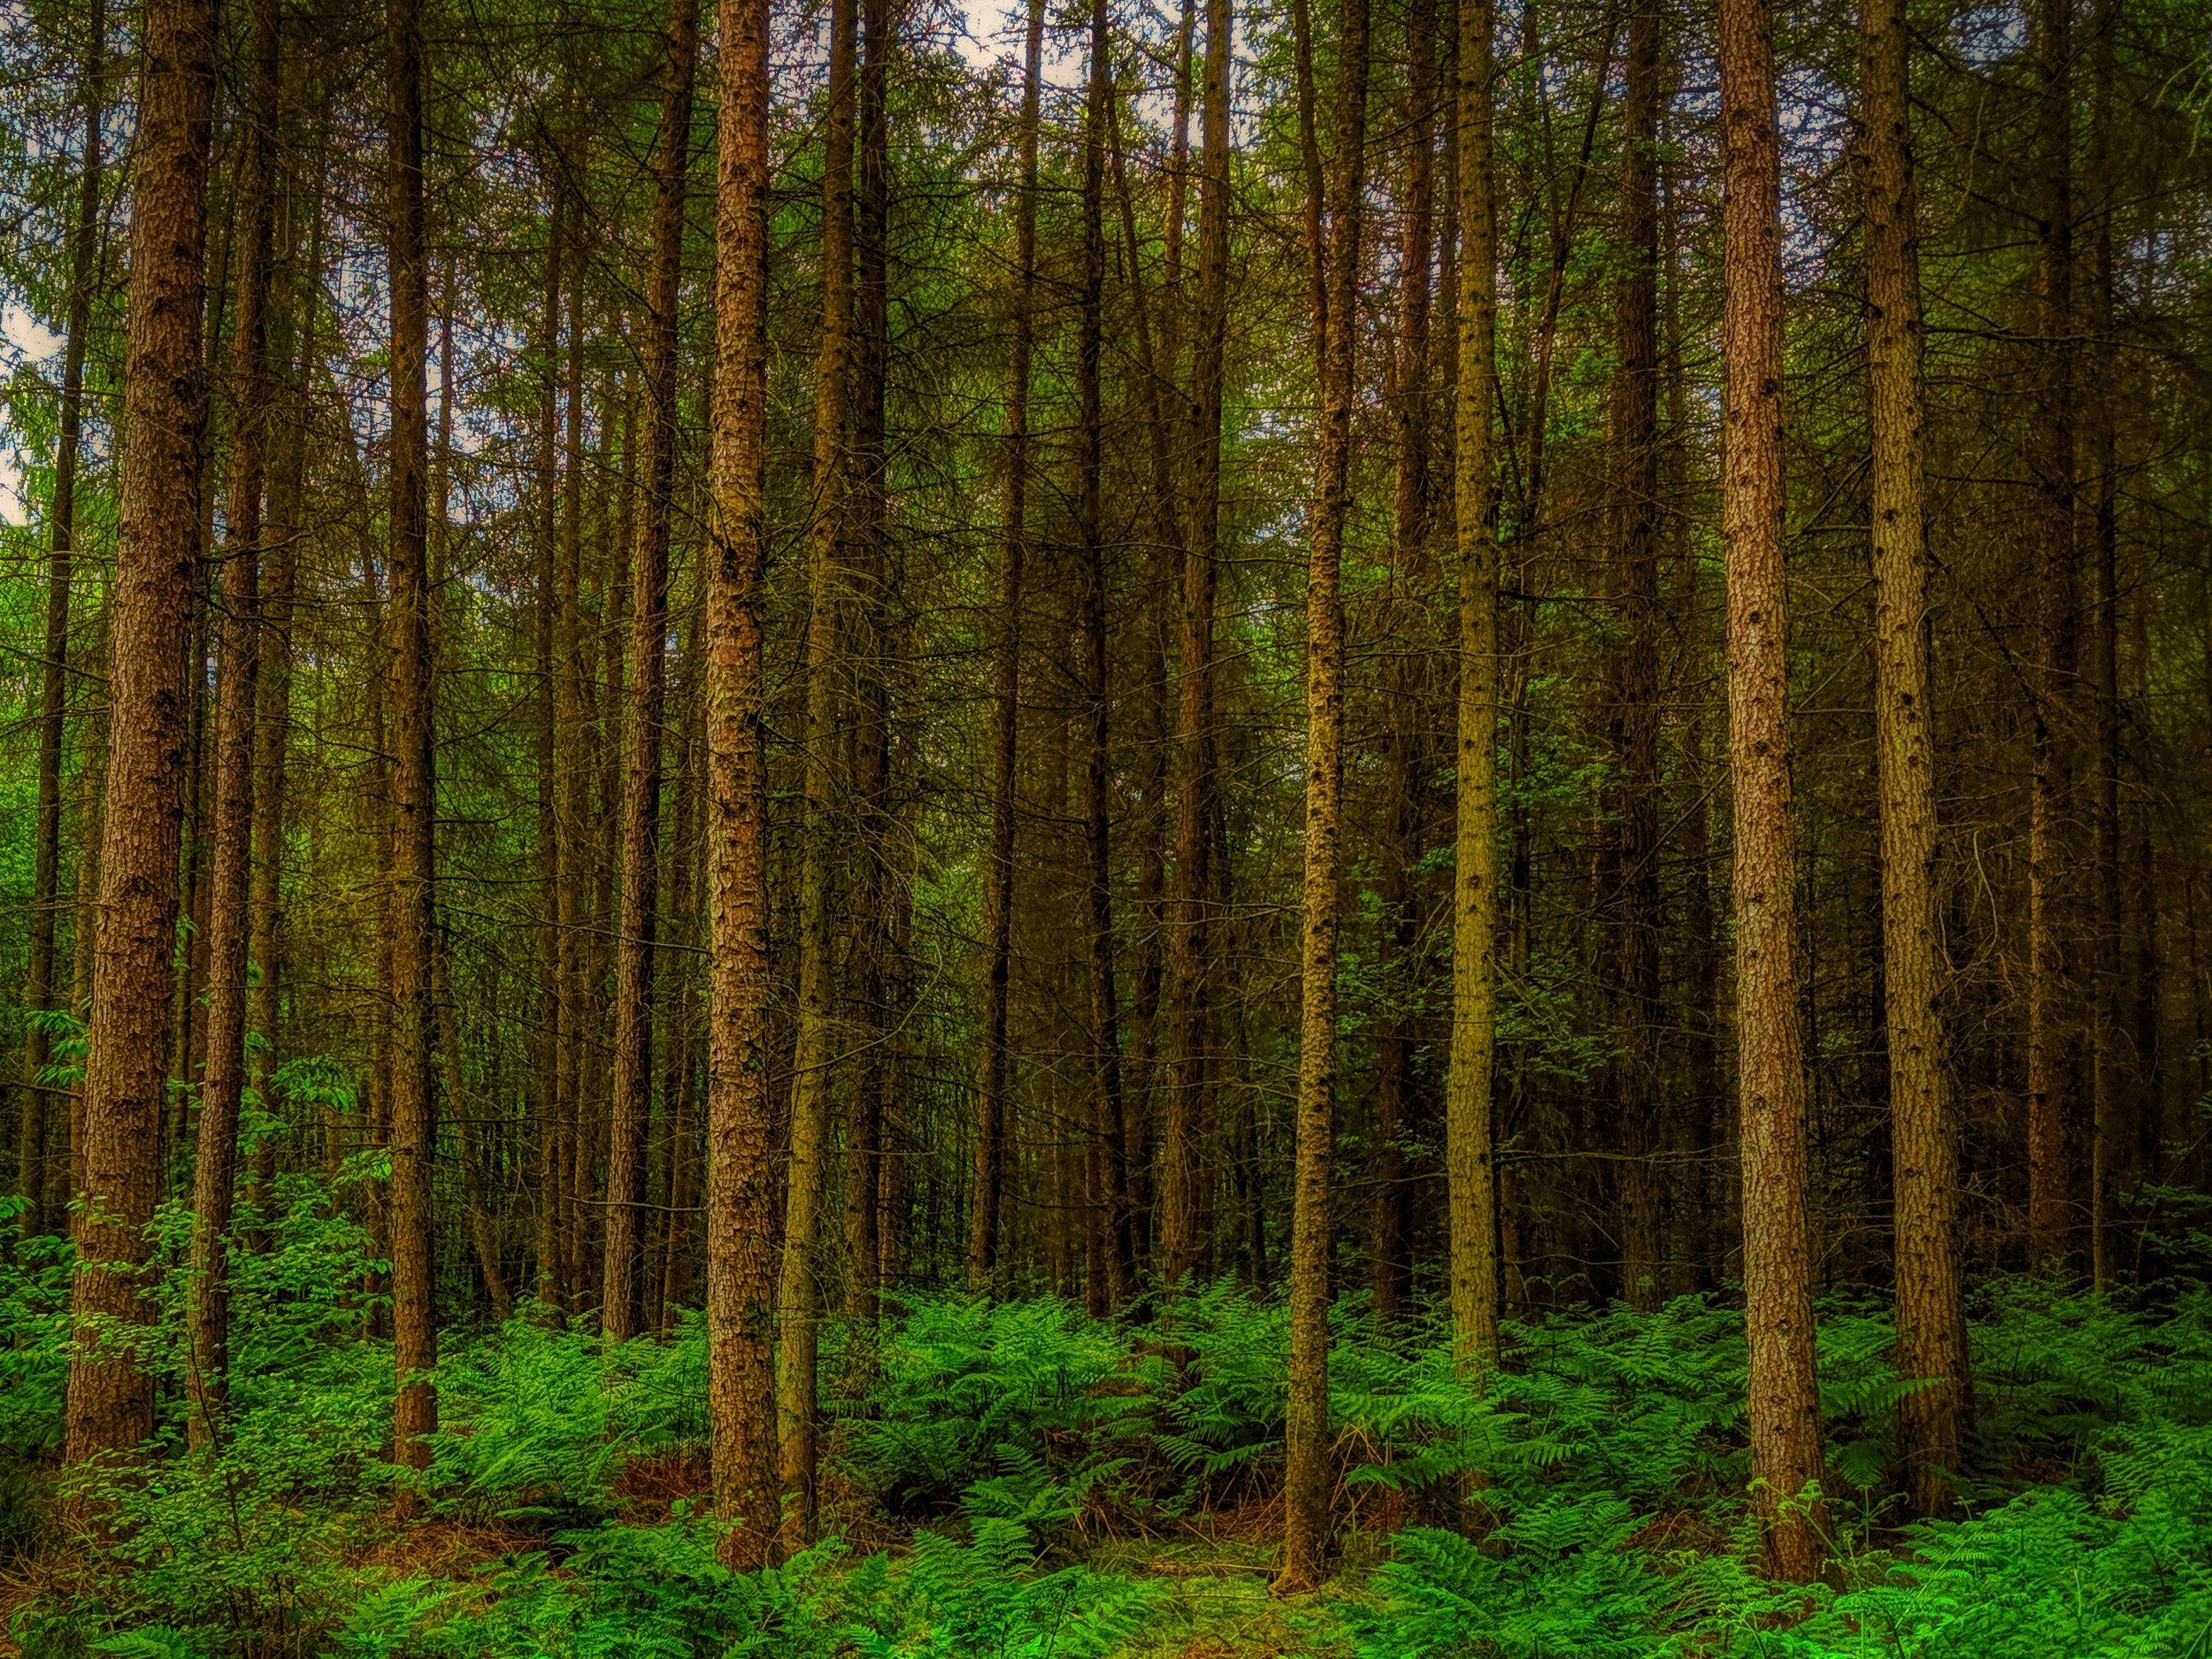 trees hdr.jpeg